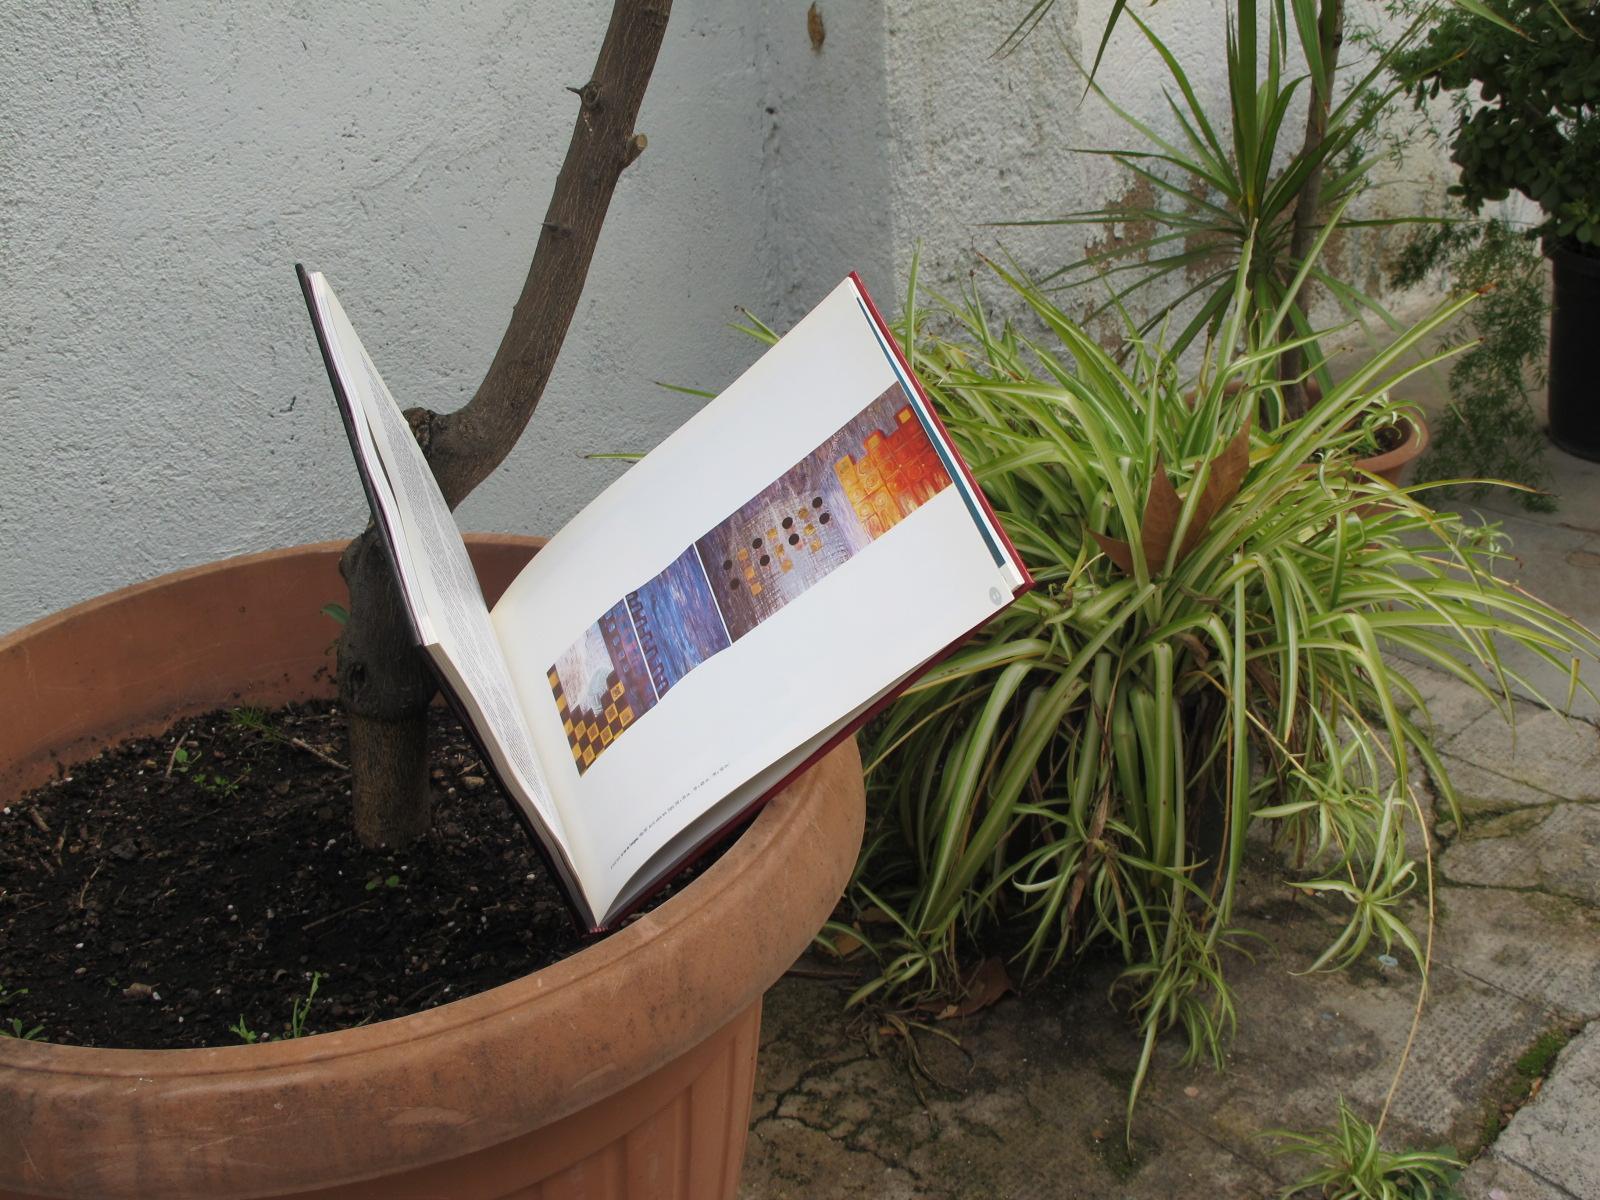 Plantar llibres, regar-los i que creixin (una flor)